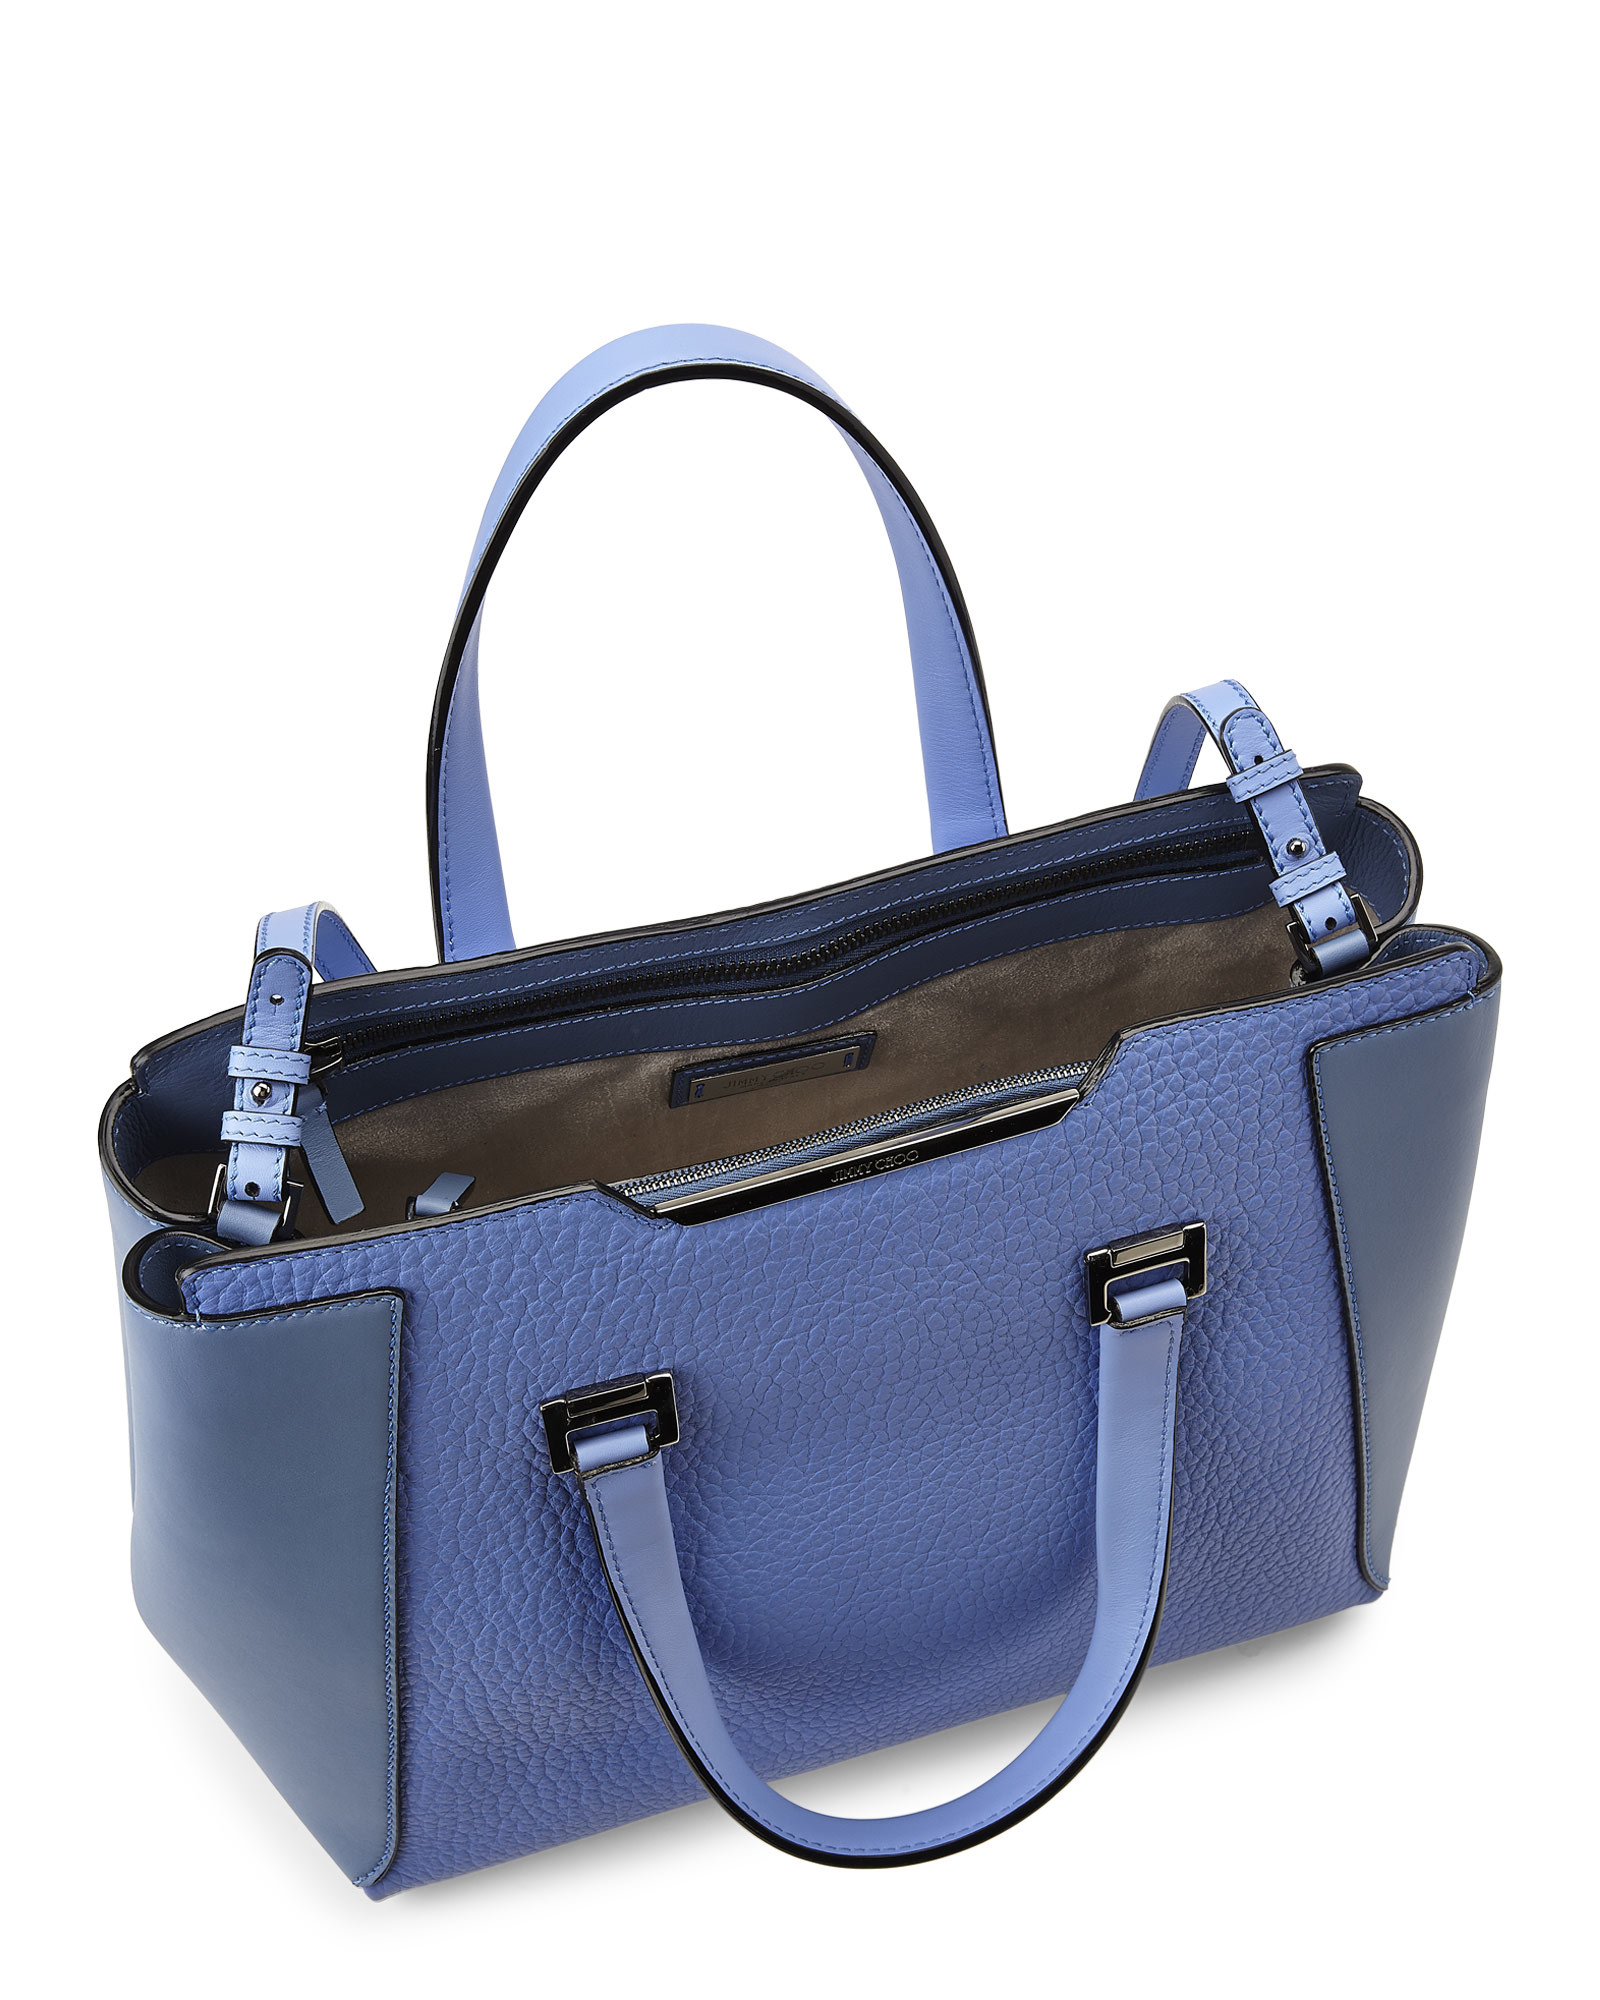 0ee4887ccbf Jimmy Choo Blue Pebbled Leather Alfie L Tote Bag in Blue - Lyst